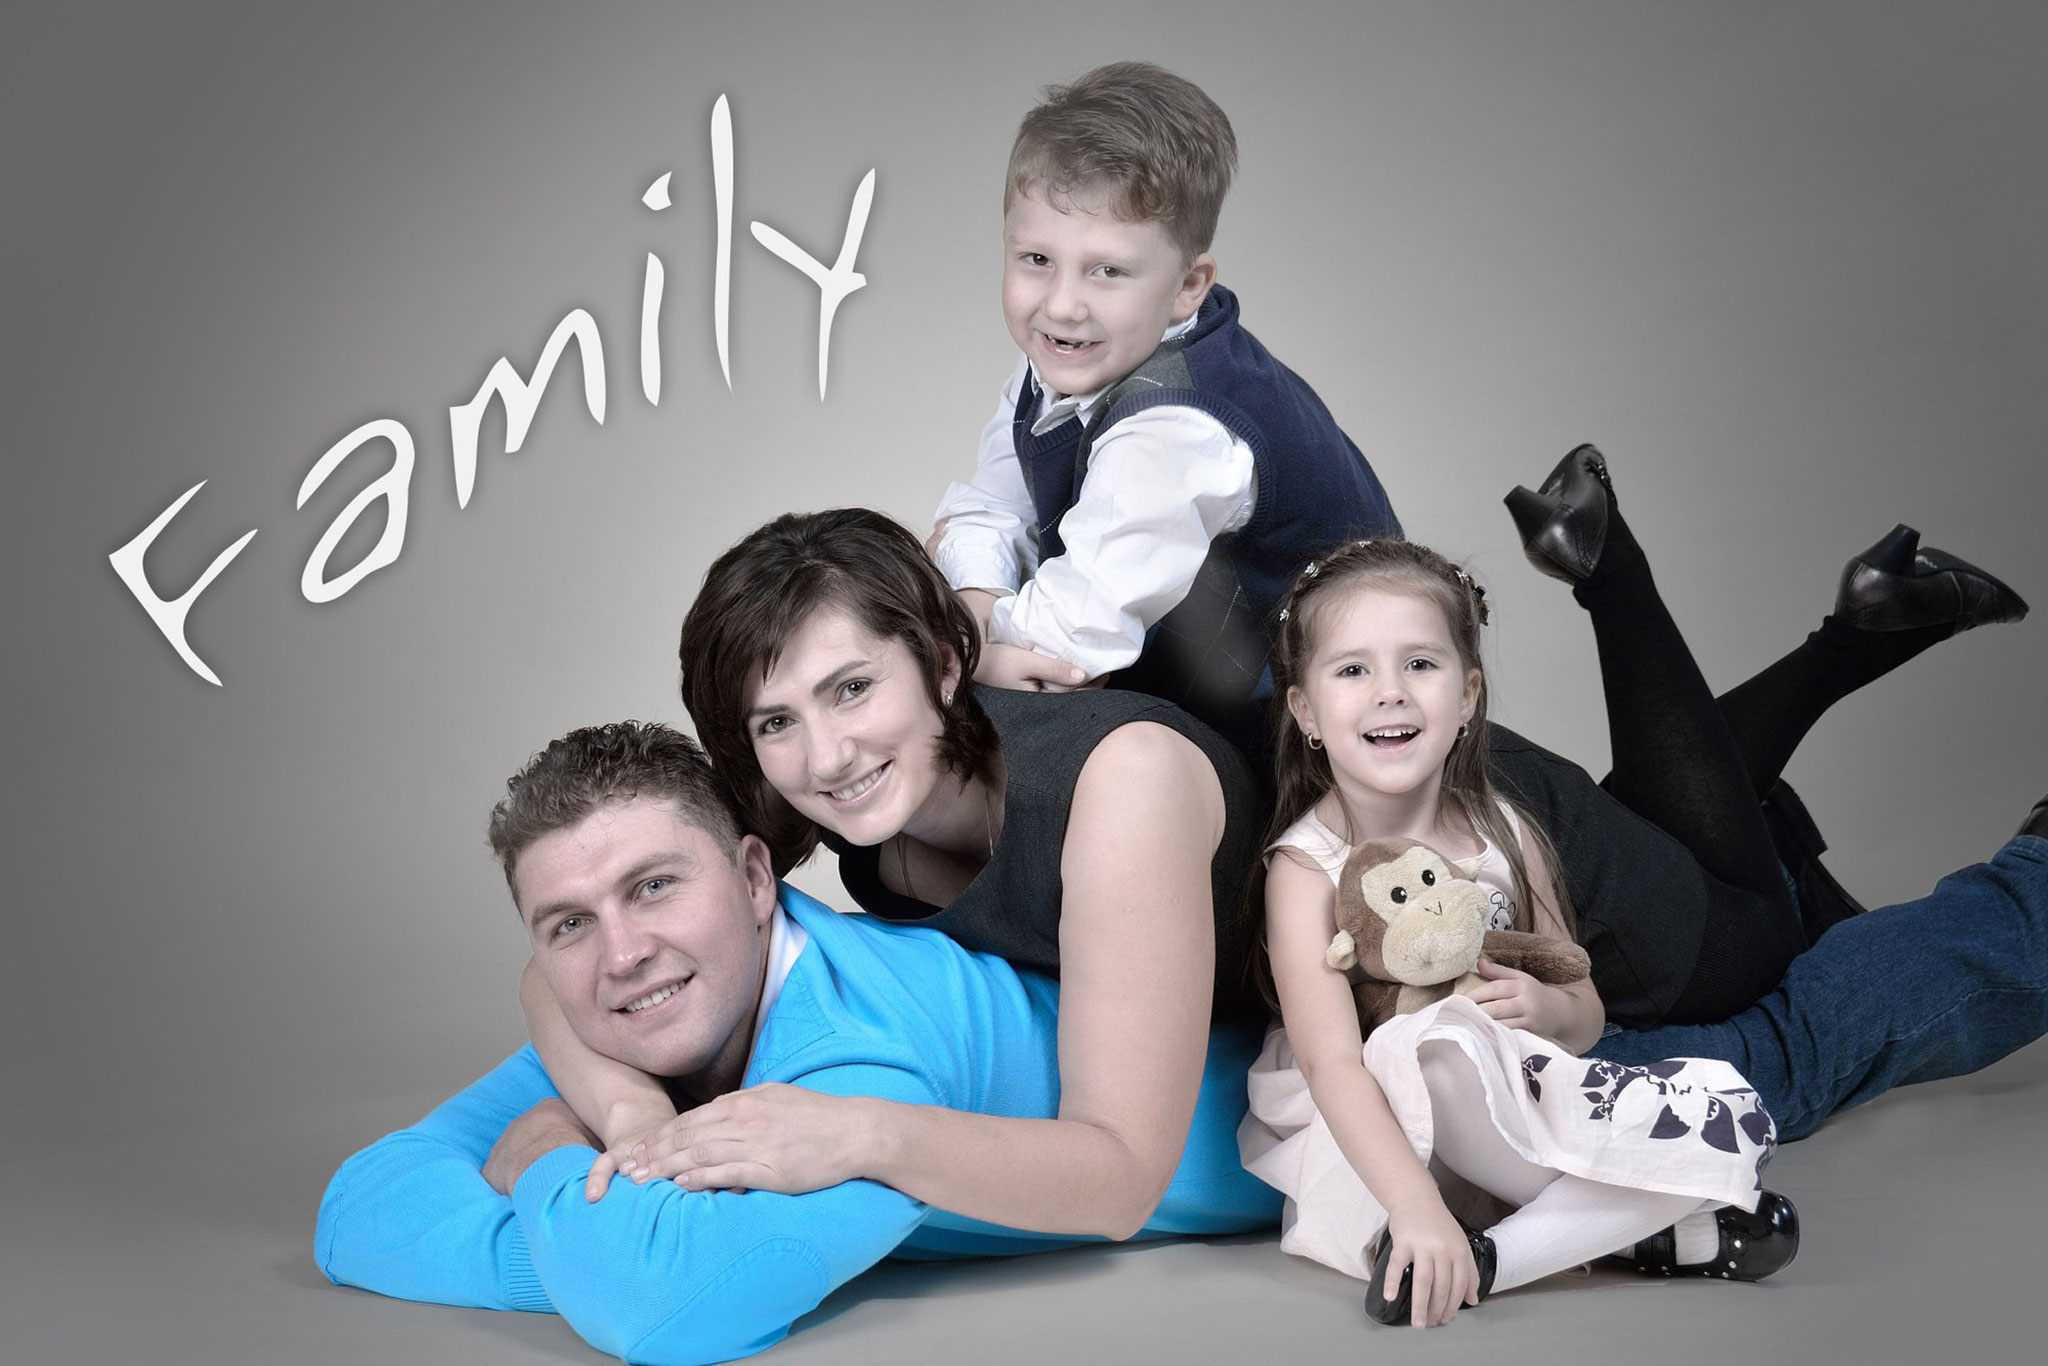 Familienfotos im Fotostudio